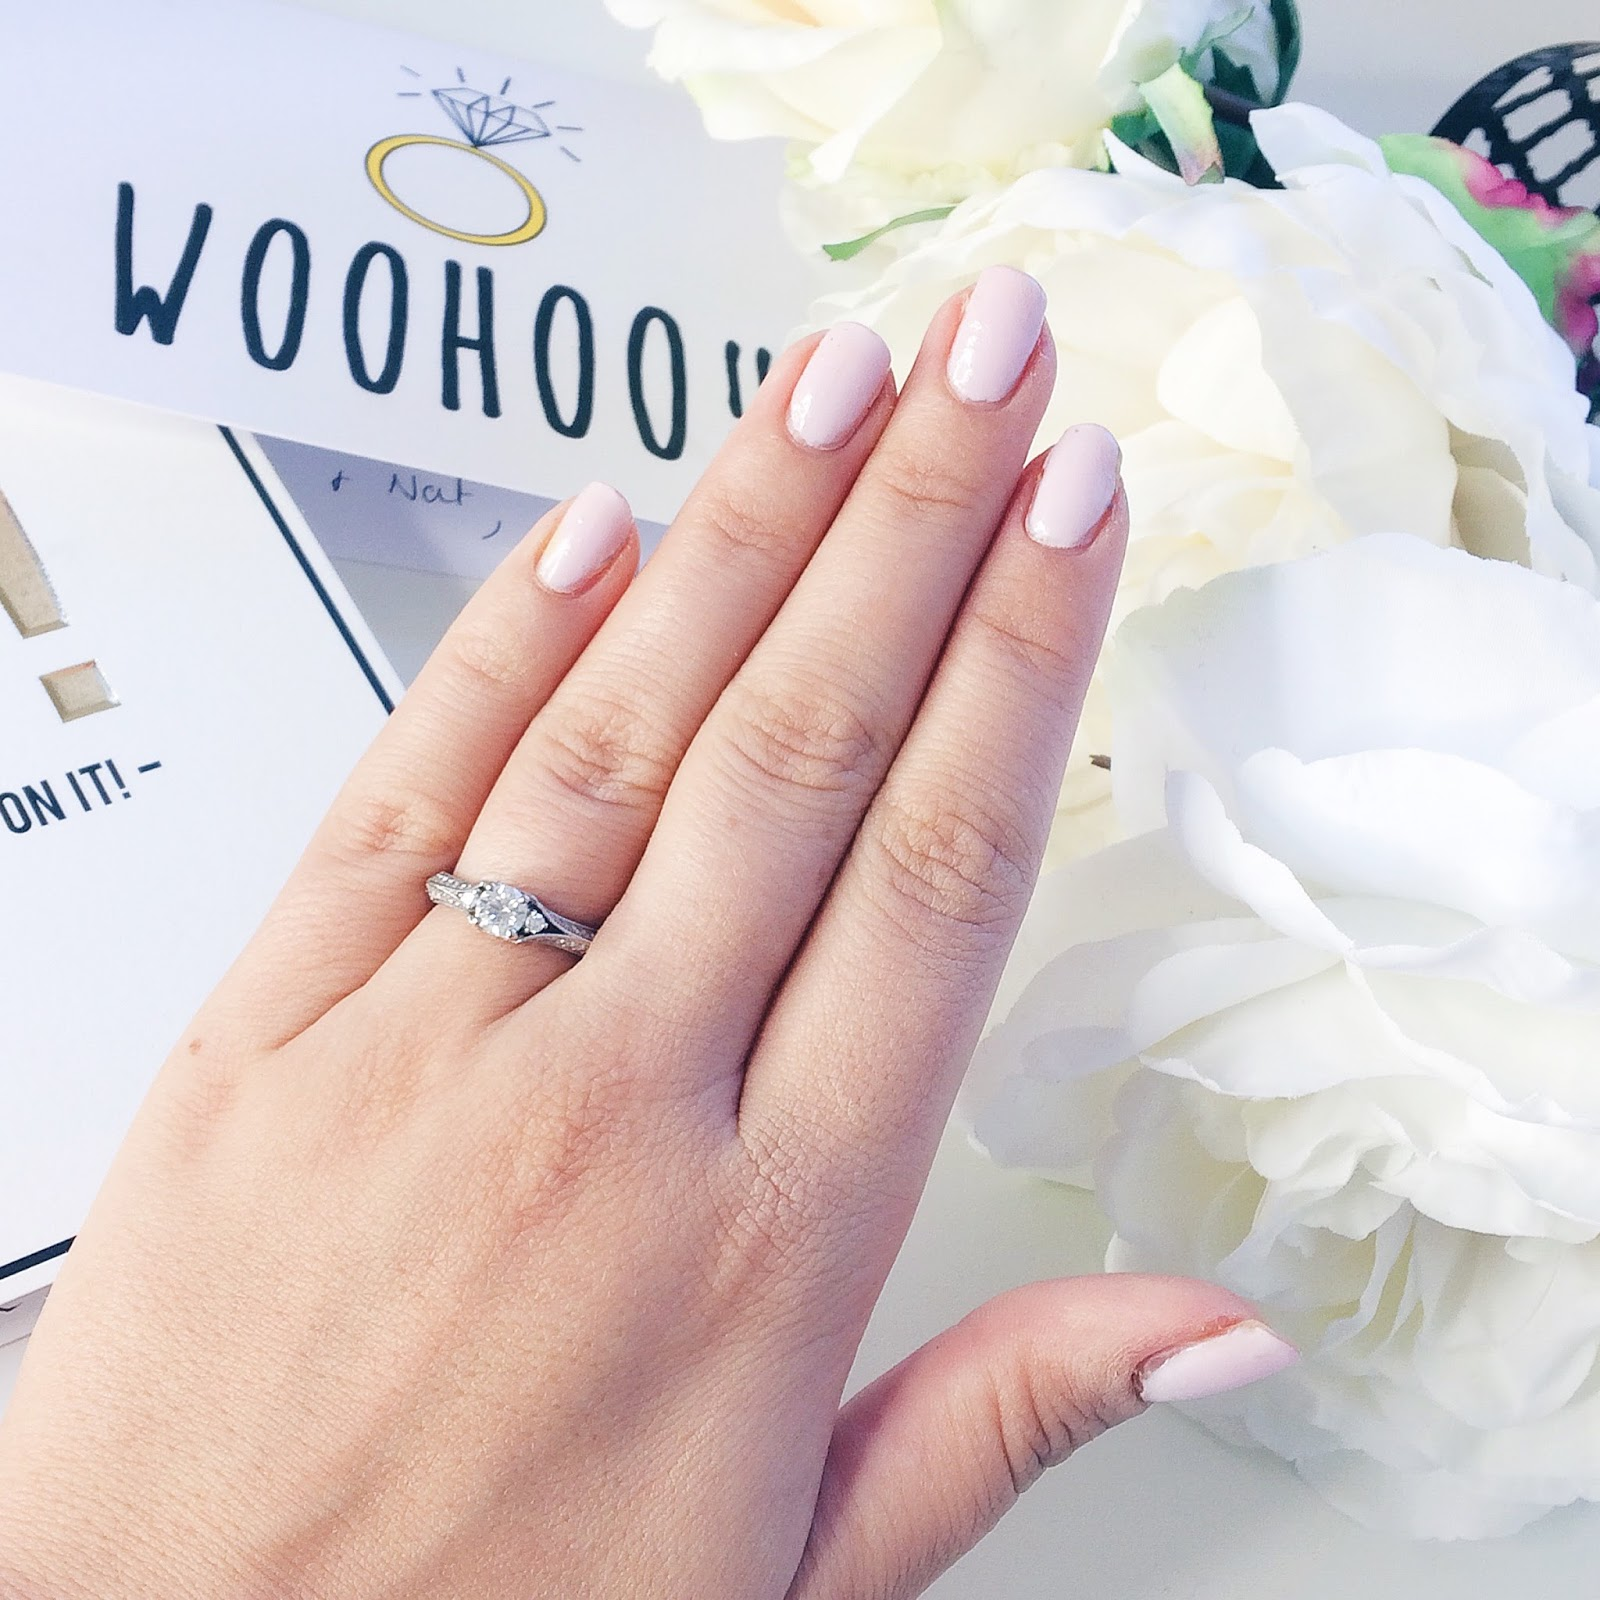 Beauty, the engagement polish, engaged, Wedding Planning, Wedding, Engagement, Essie, Essie Minimalistic, Nail Polish, Nails, Proposal, Dizzybrunette3 Proposal